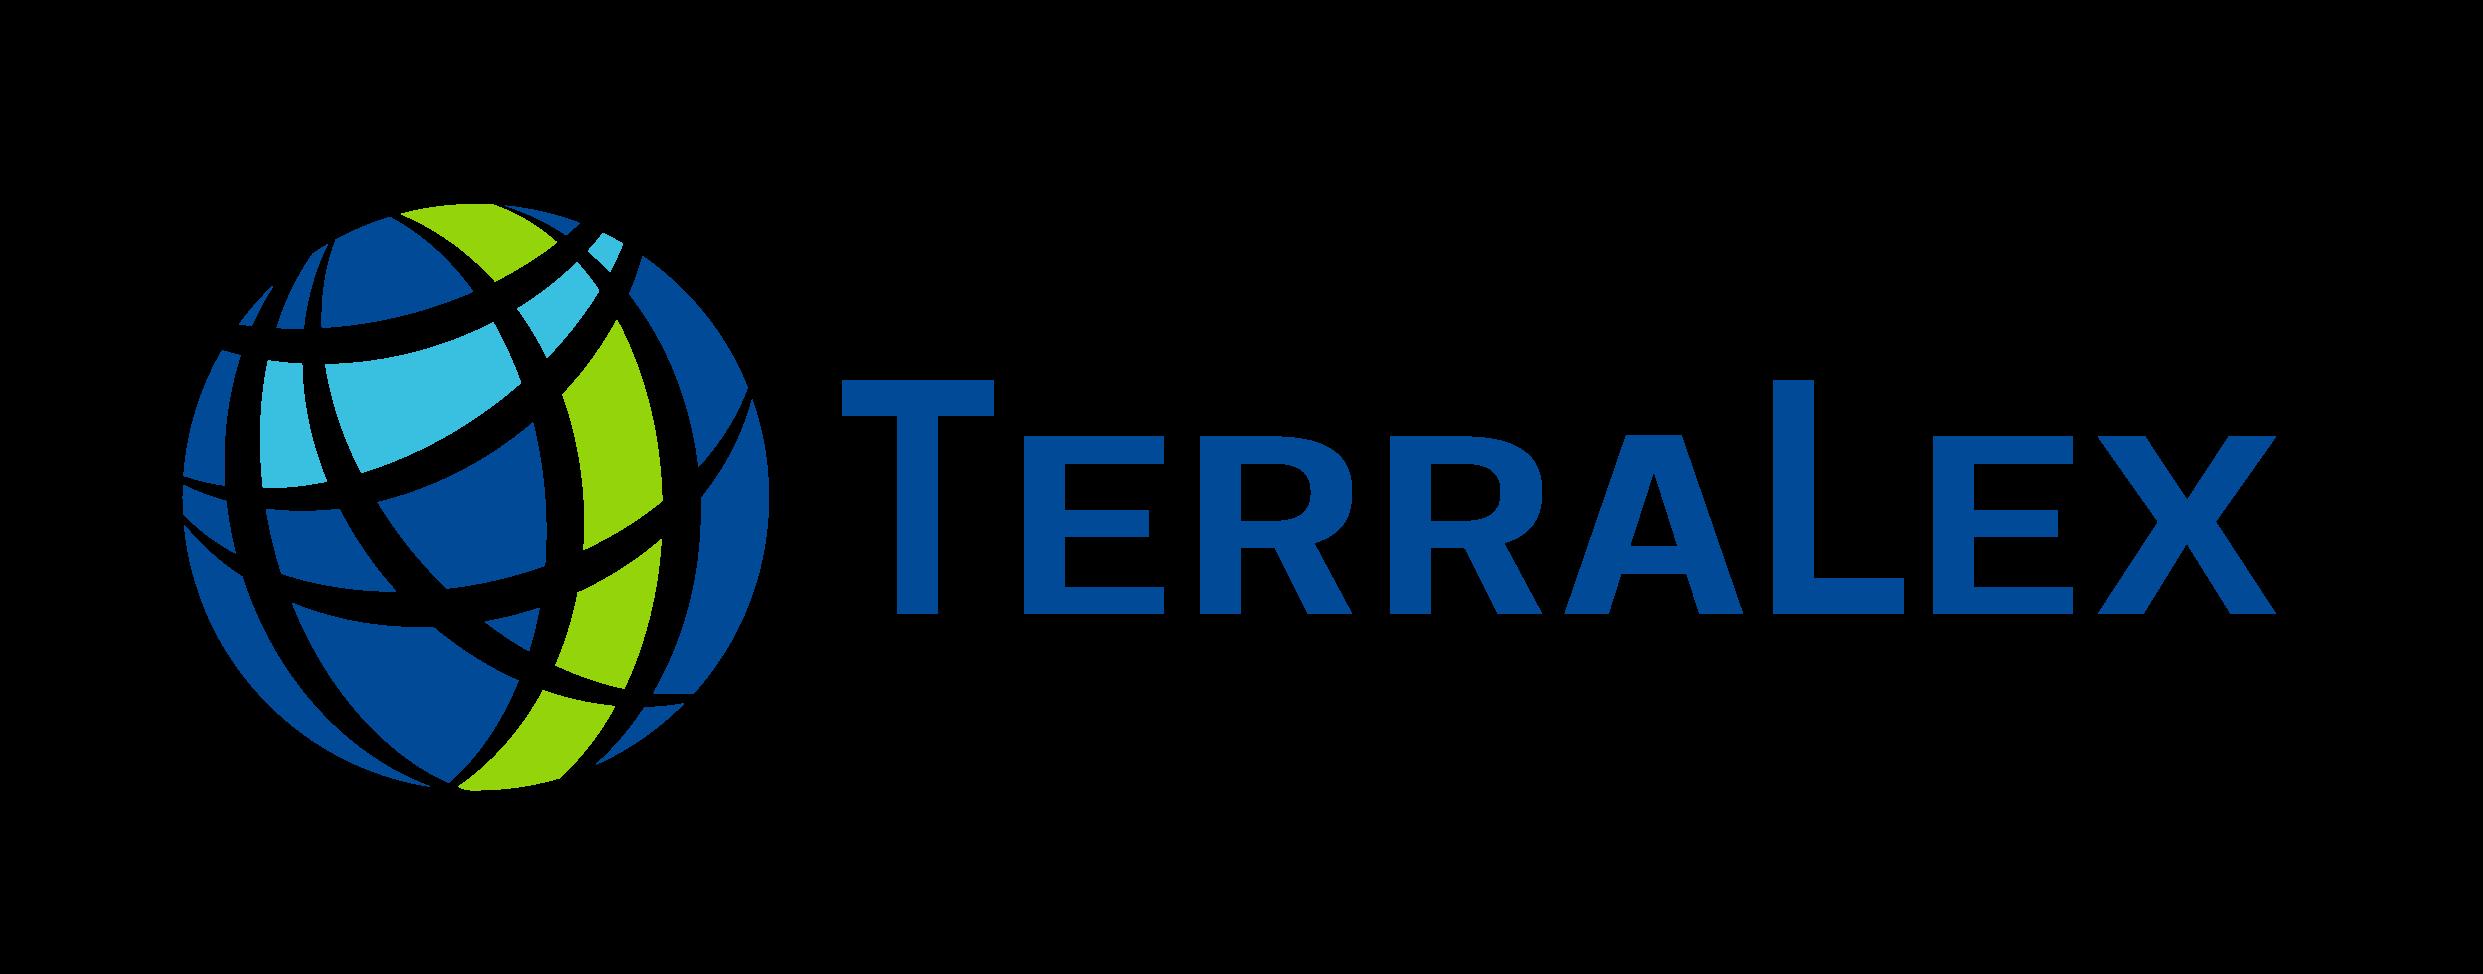 RGB Primary Logo_Terralex_10-01